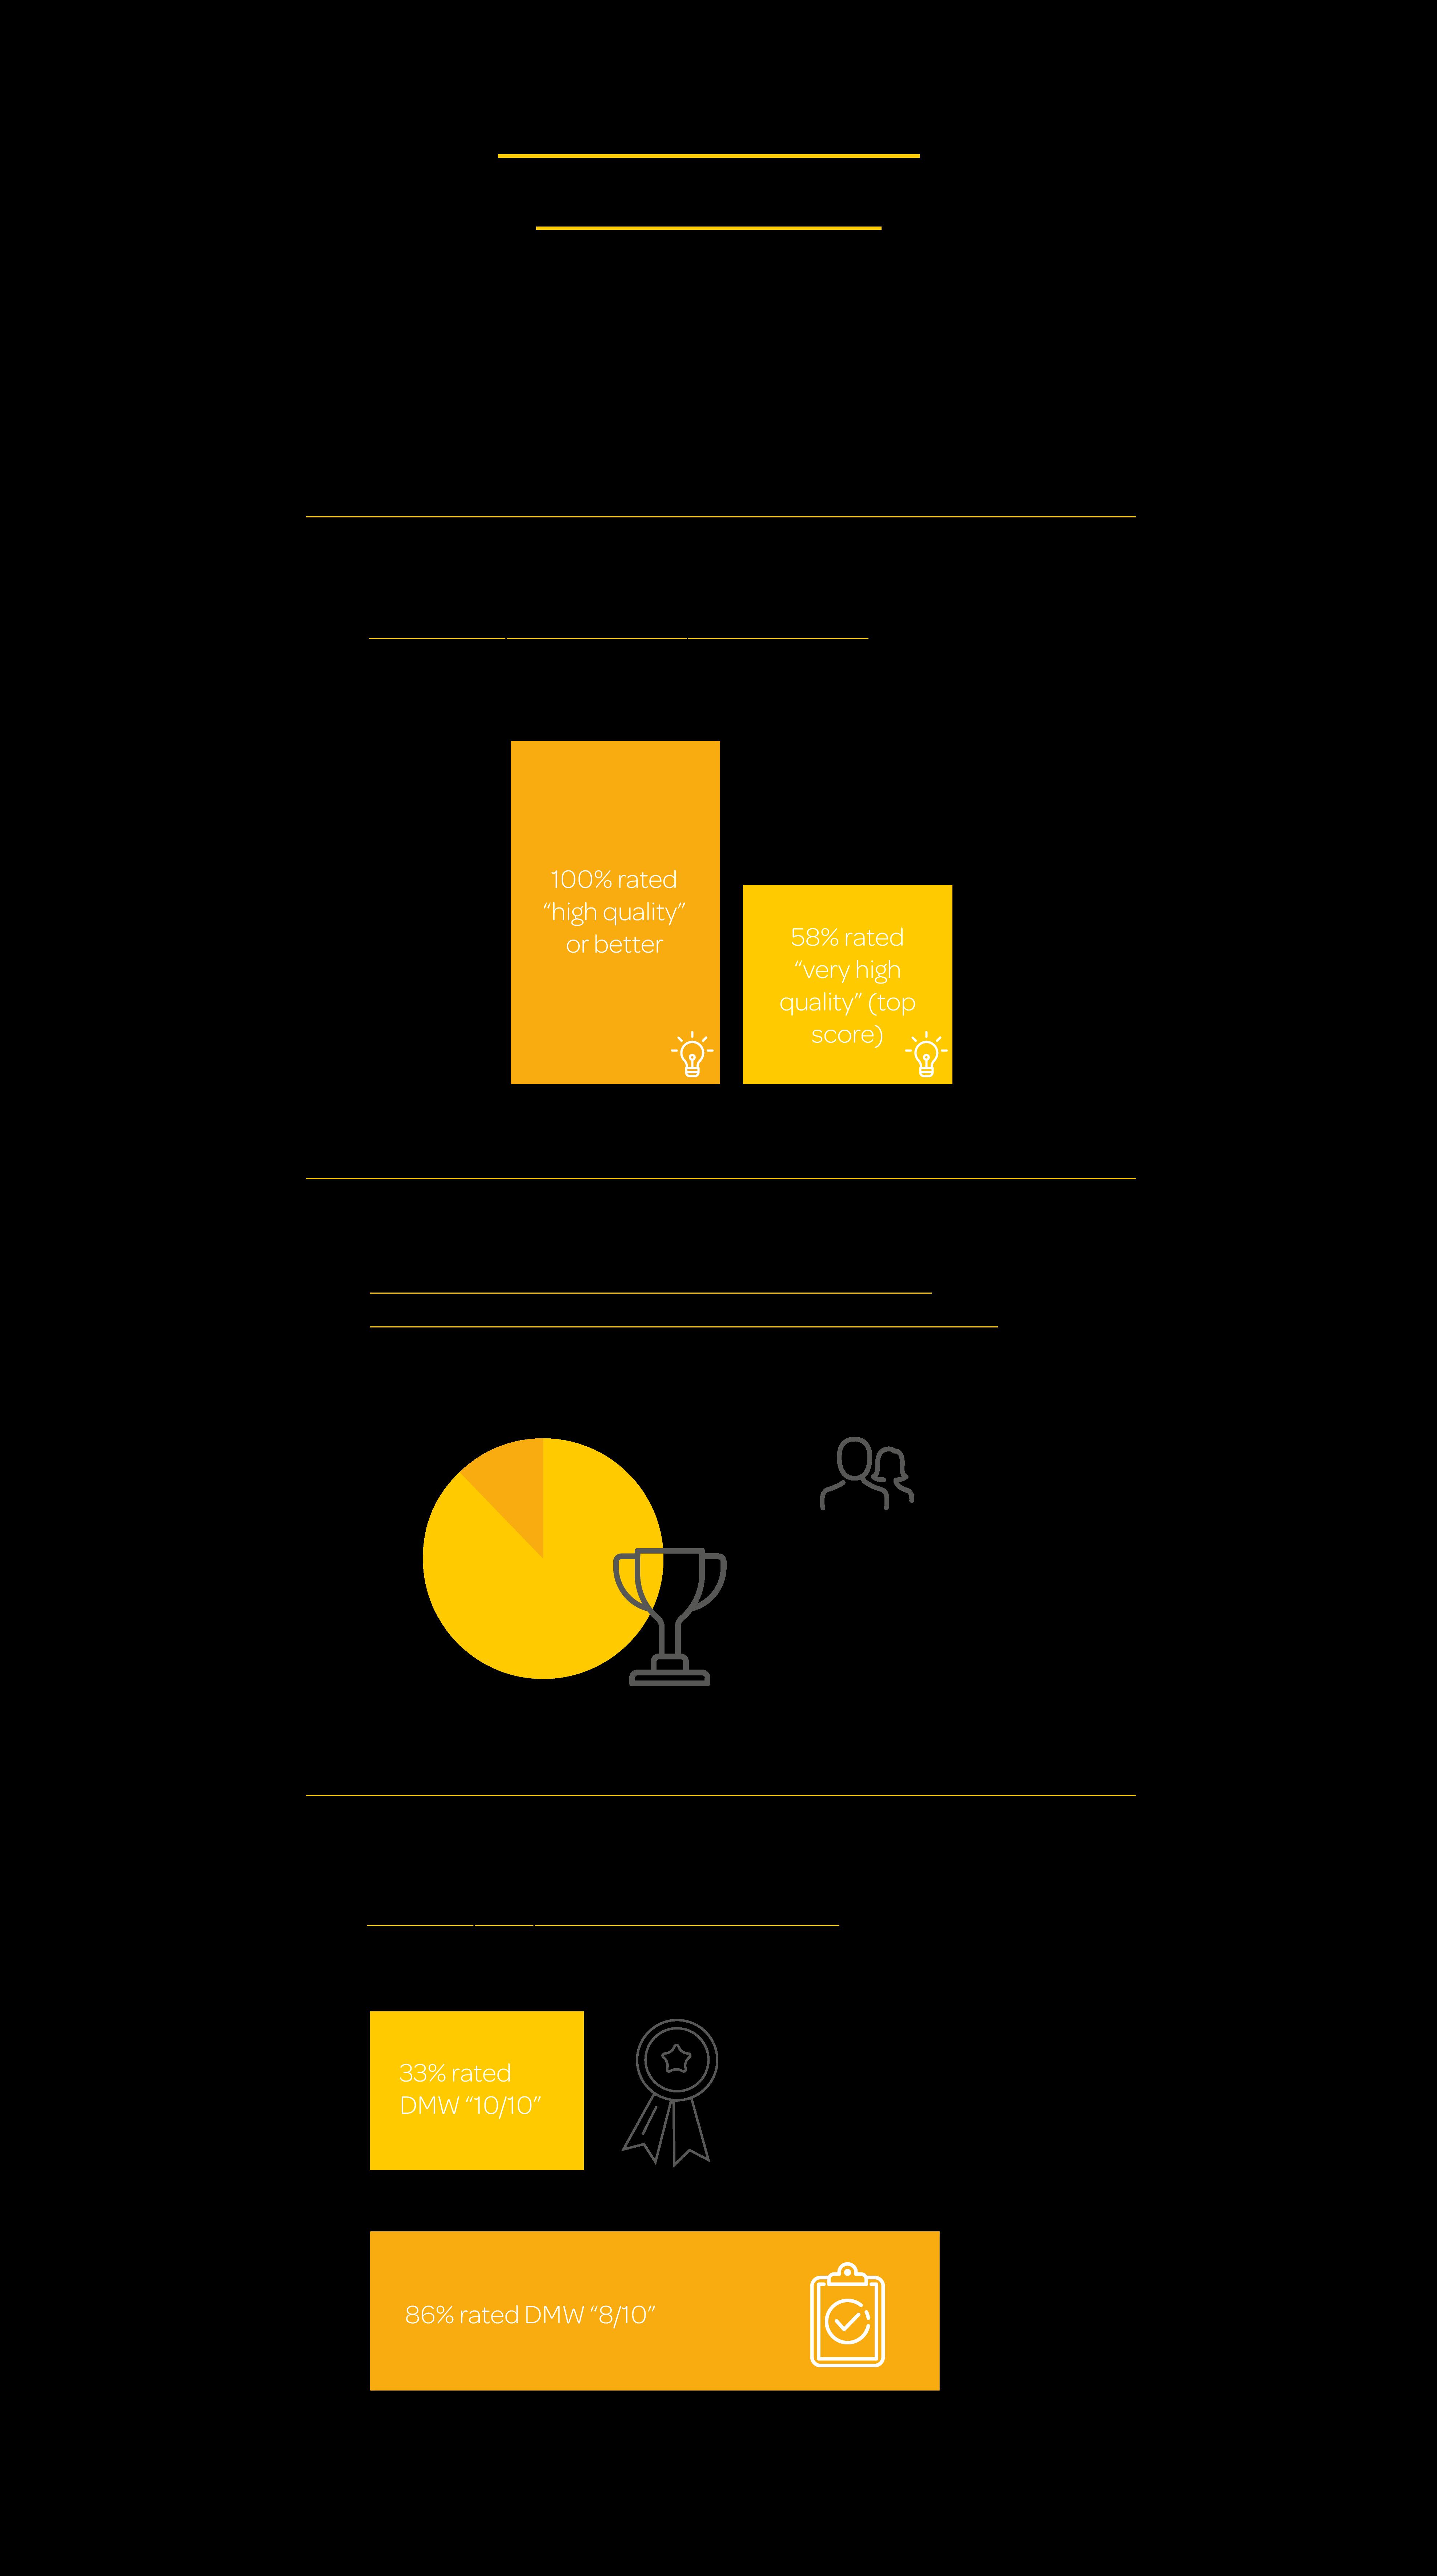 Customer-results-survey-infographic-2020V2